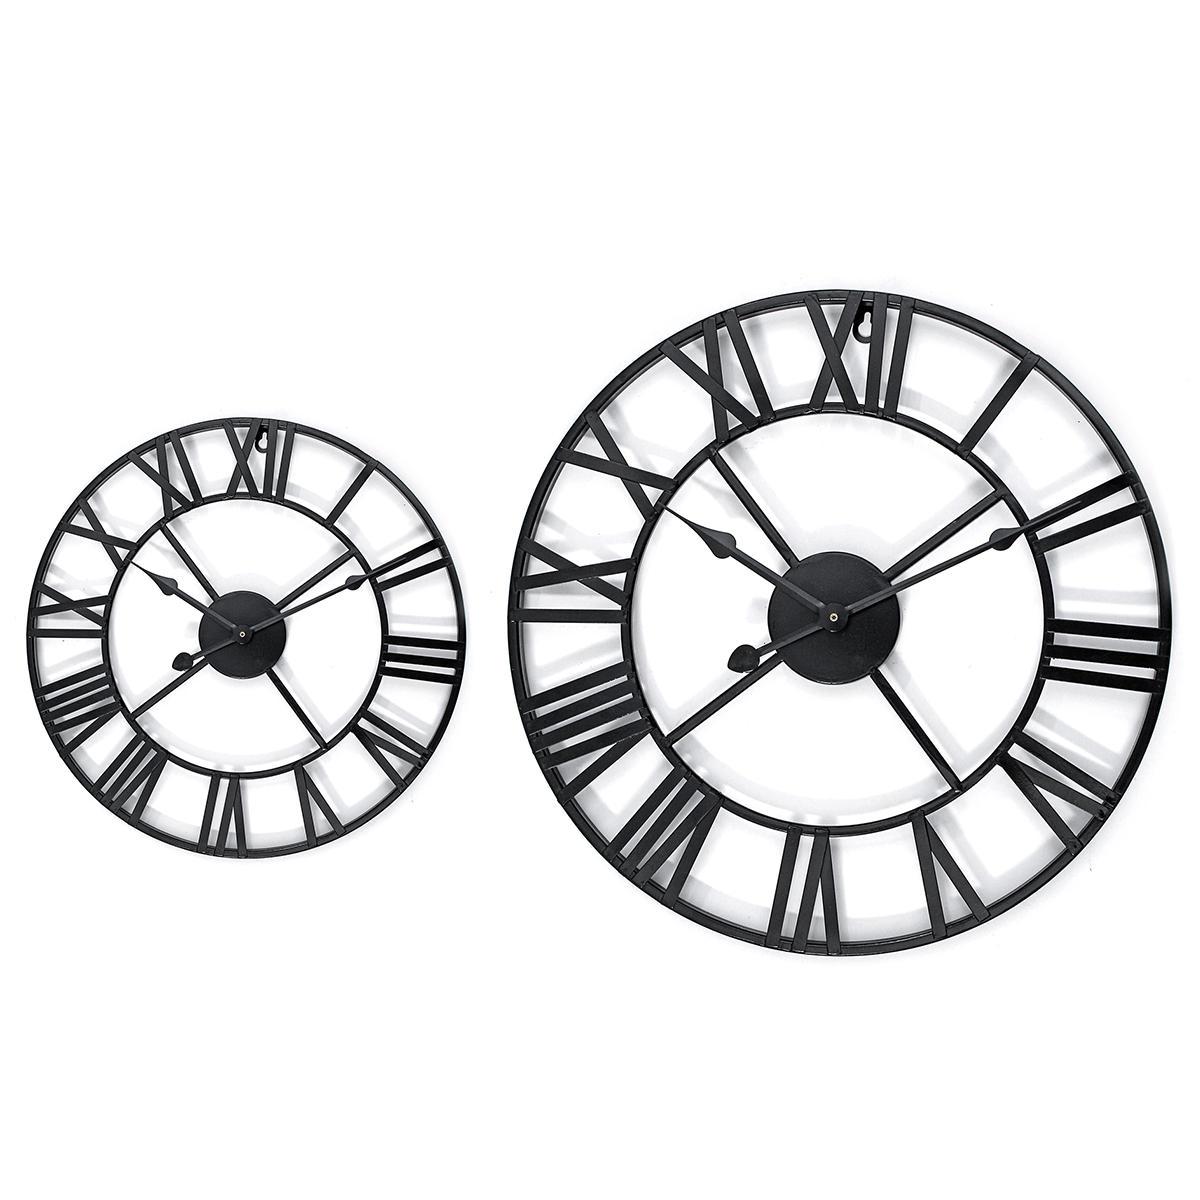 40 60cm Large Metal Skeleton Roman Numeral Wall Clock